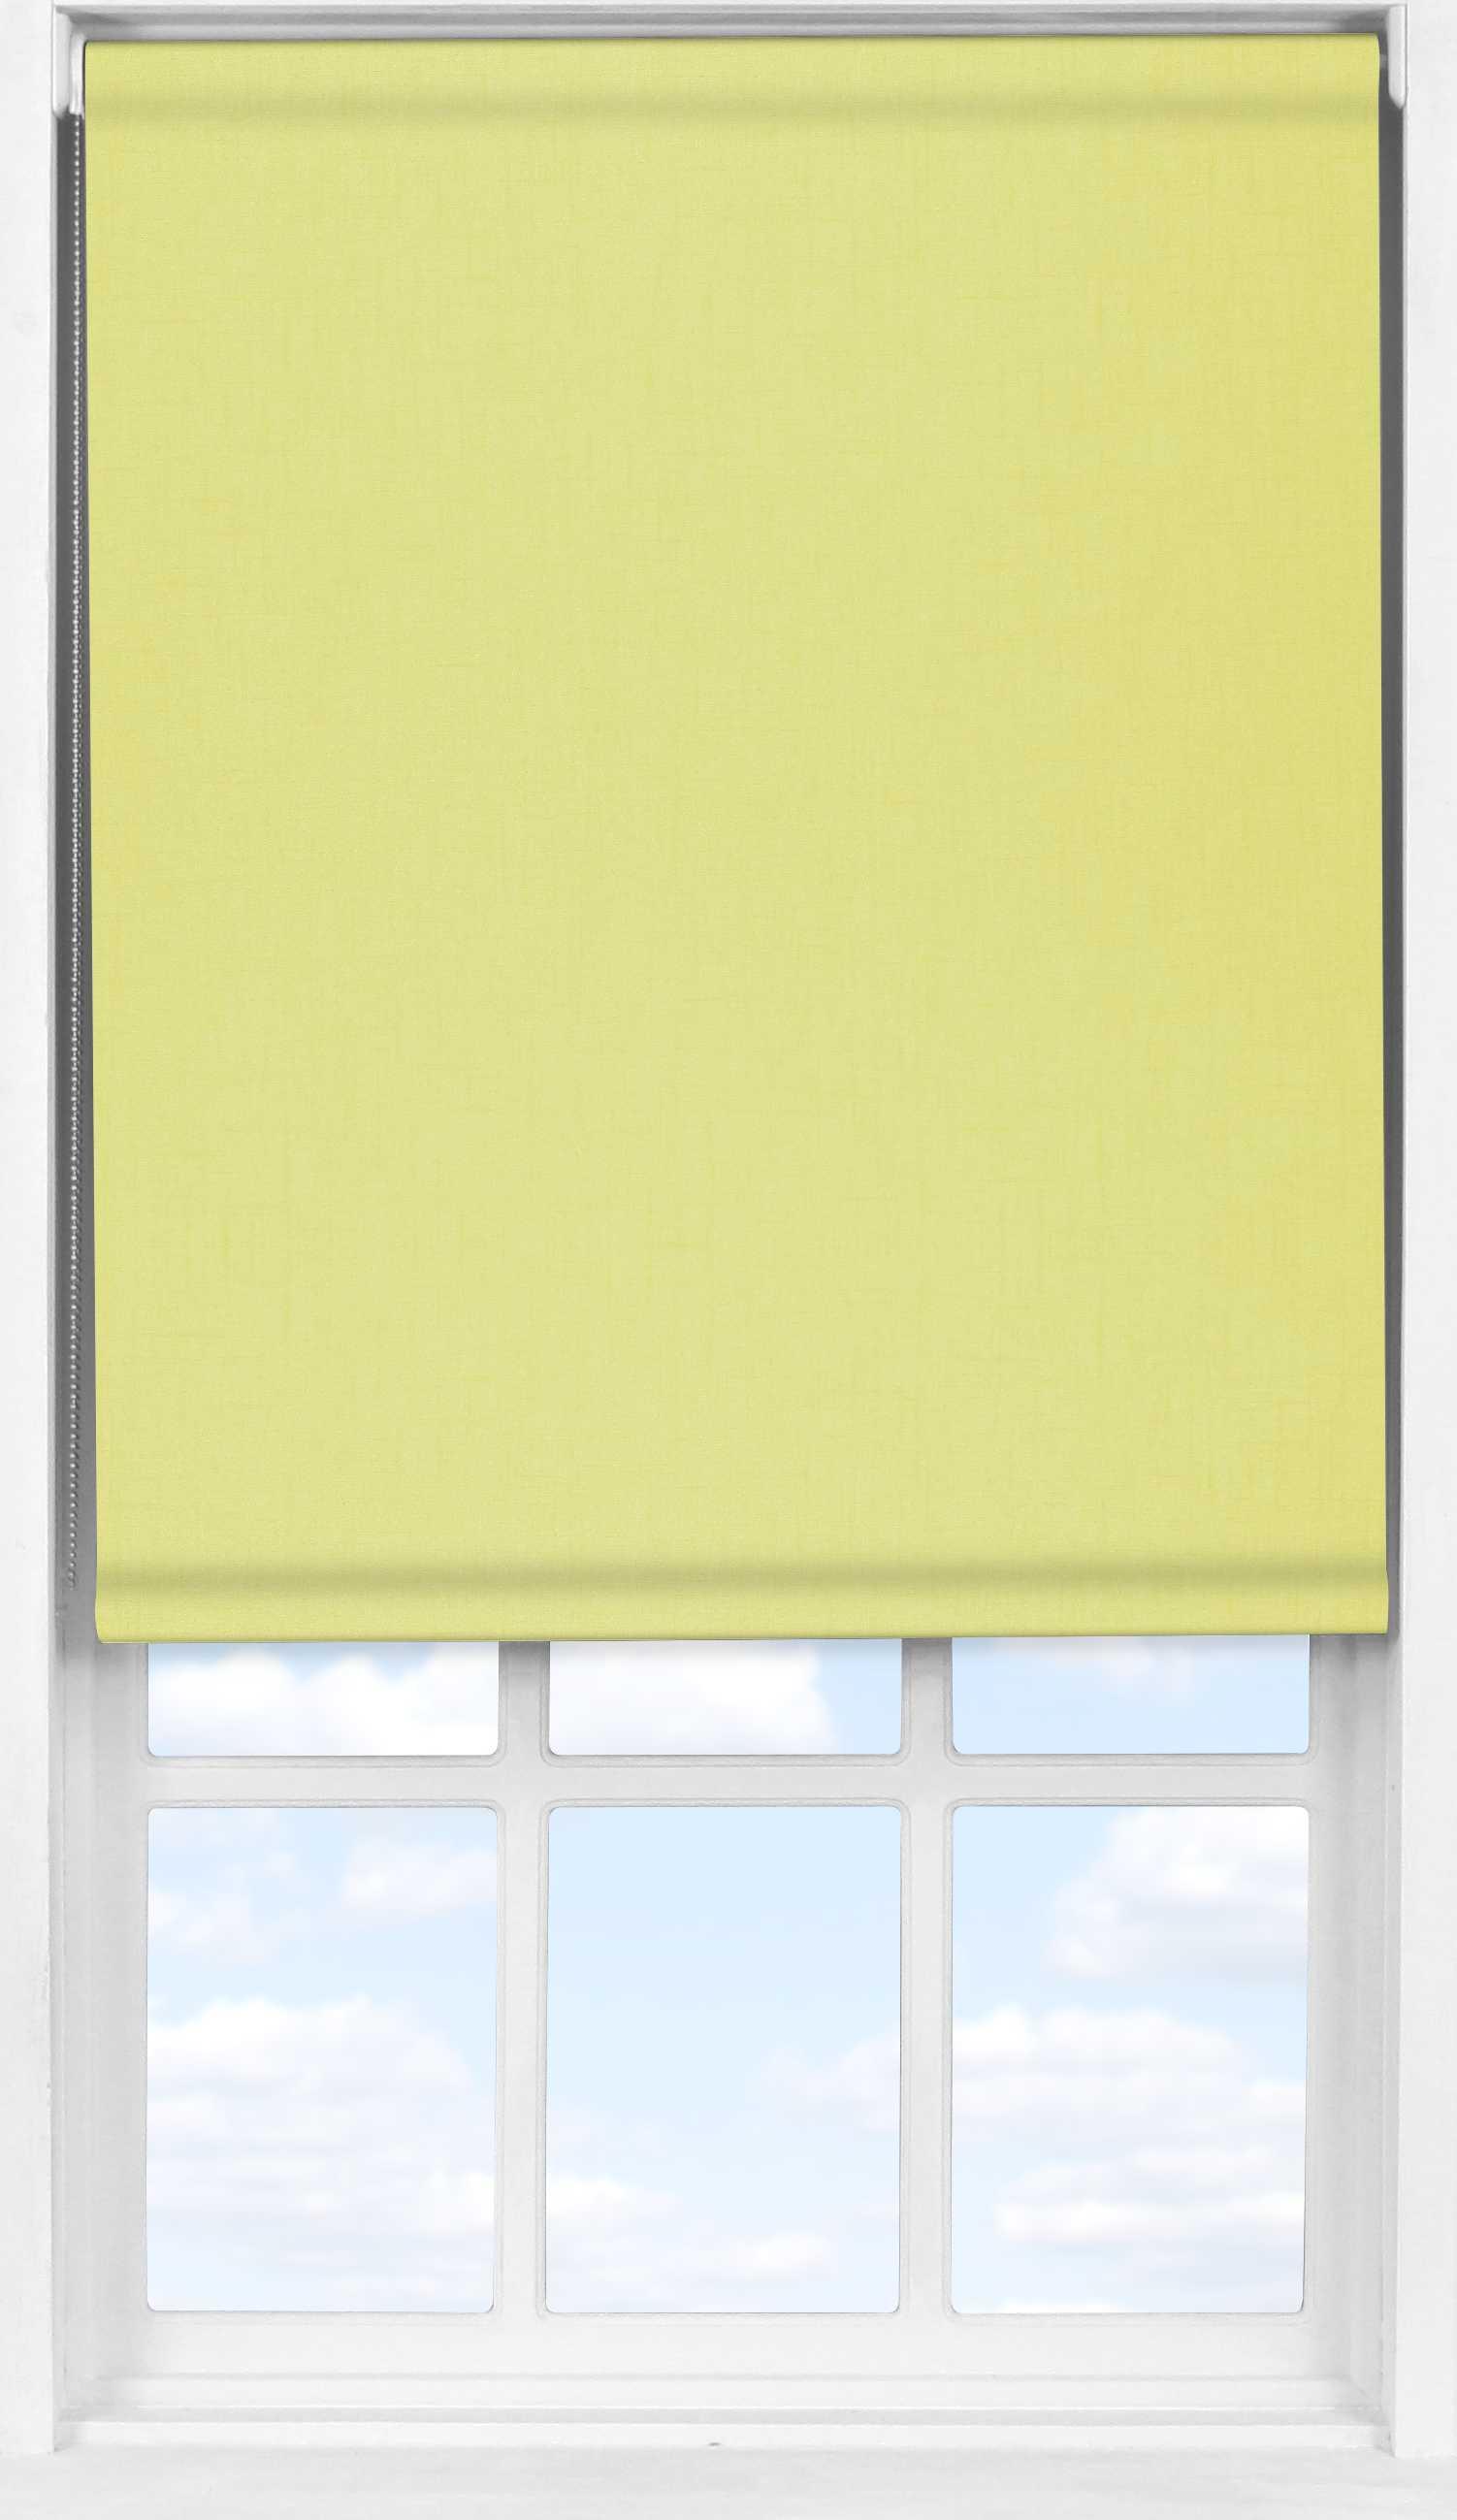 Easifit Roller Blind in Spectrum Lemonade Blackout